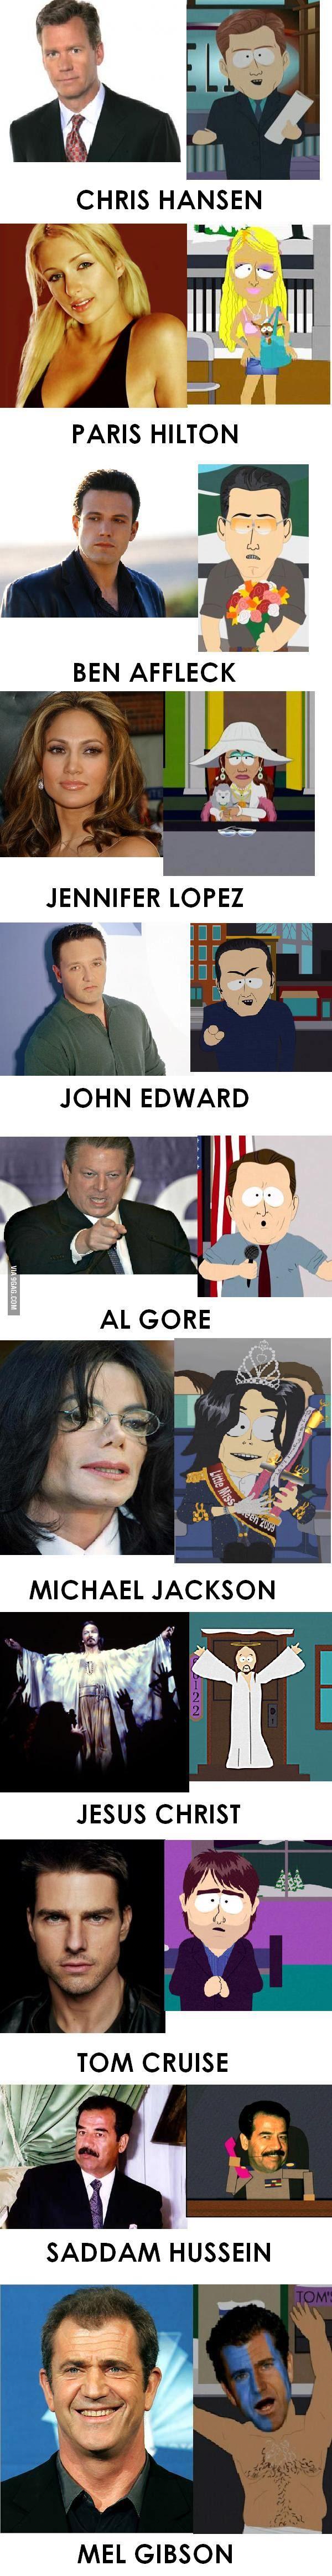 South Park Celebrities